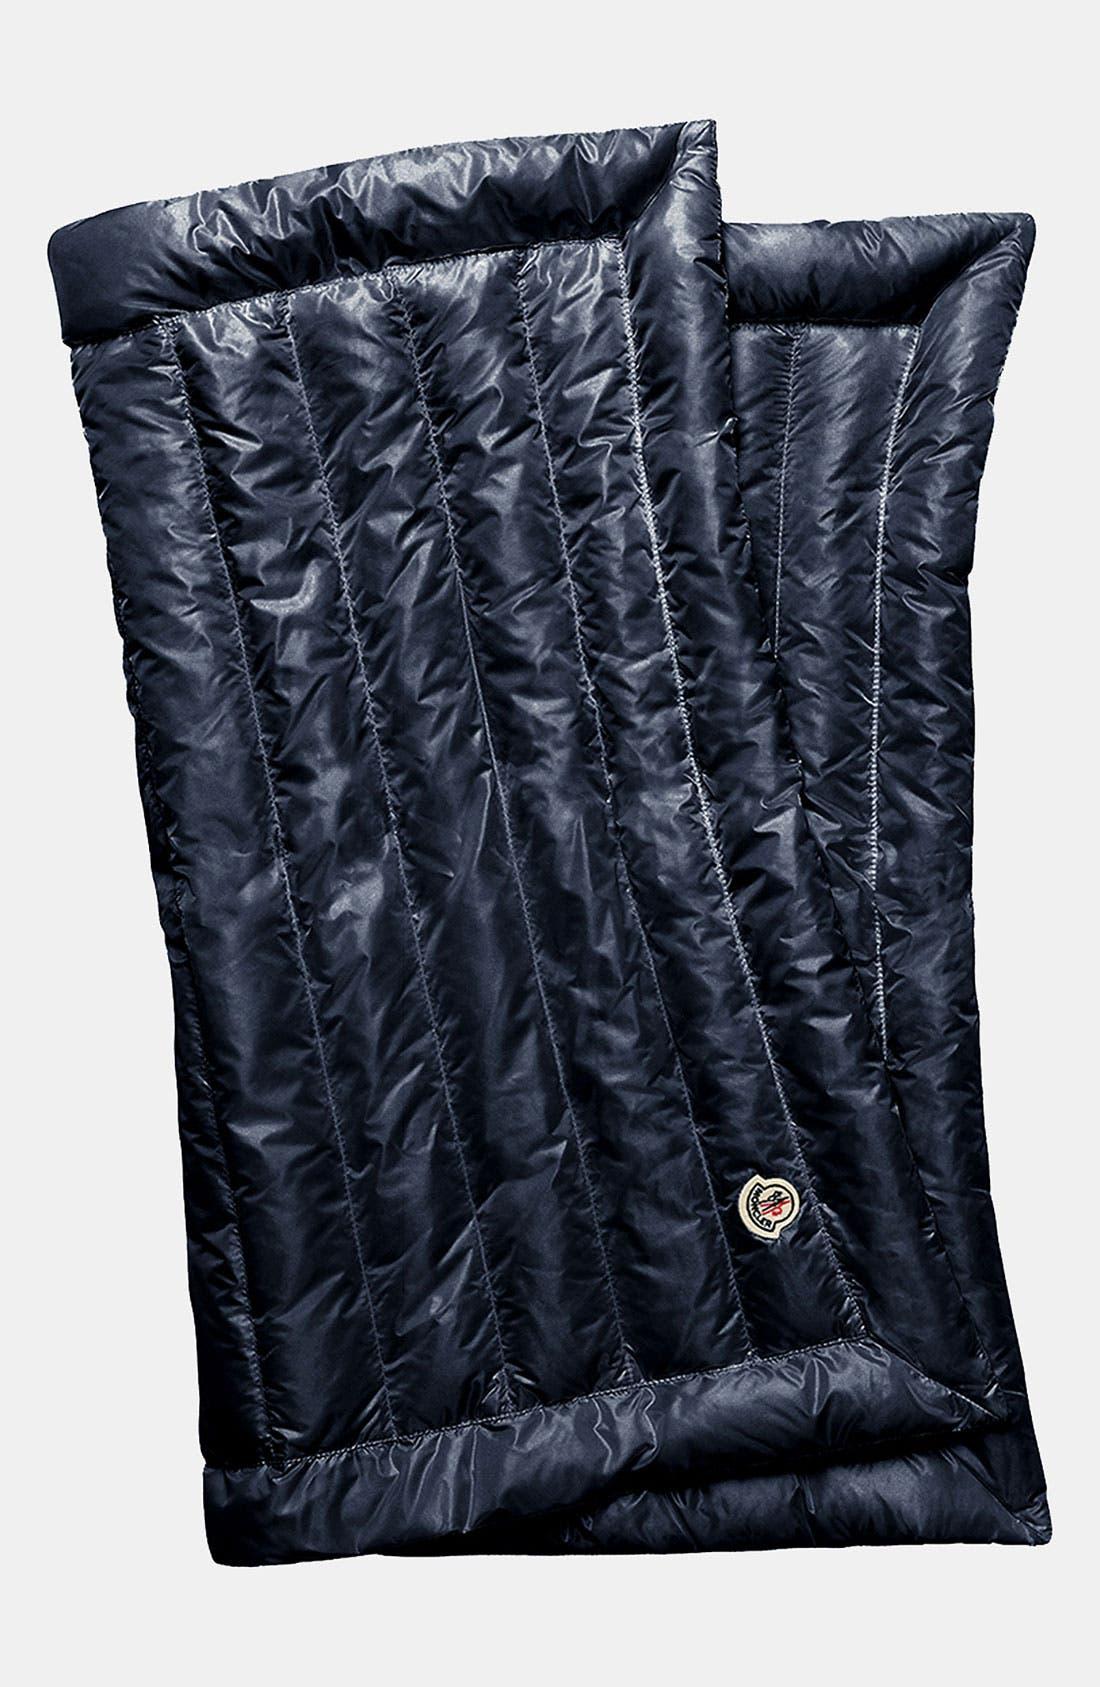 Alternate Image 1 Selected - Moncler 'Couverture' Blanket